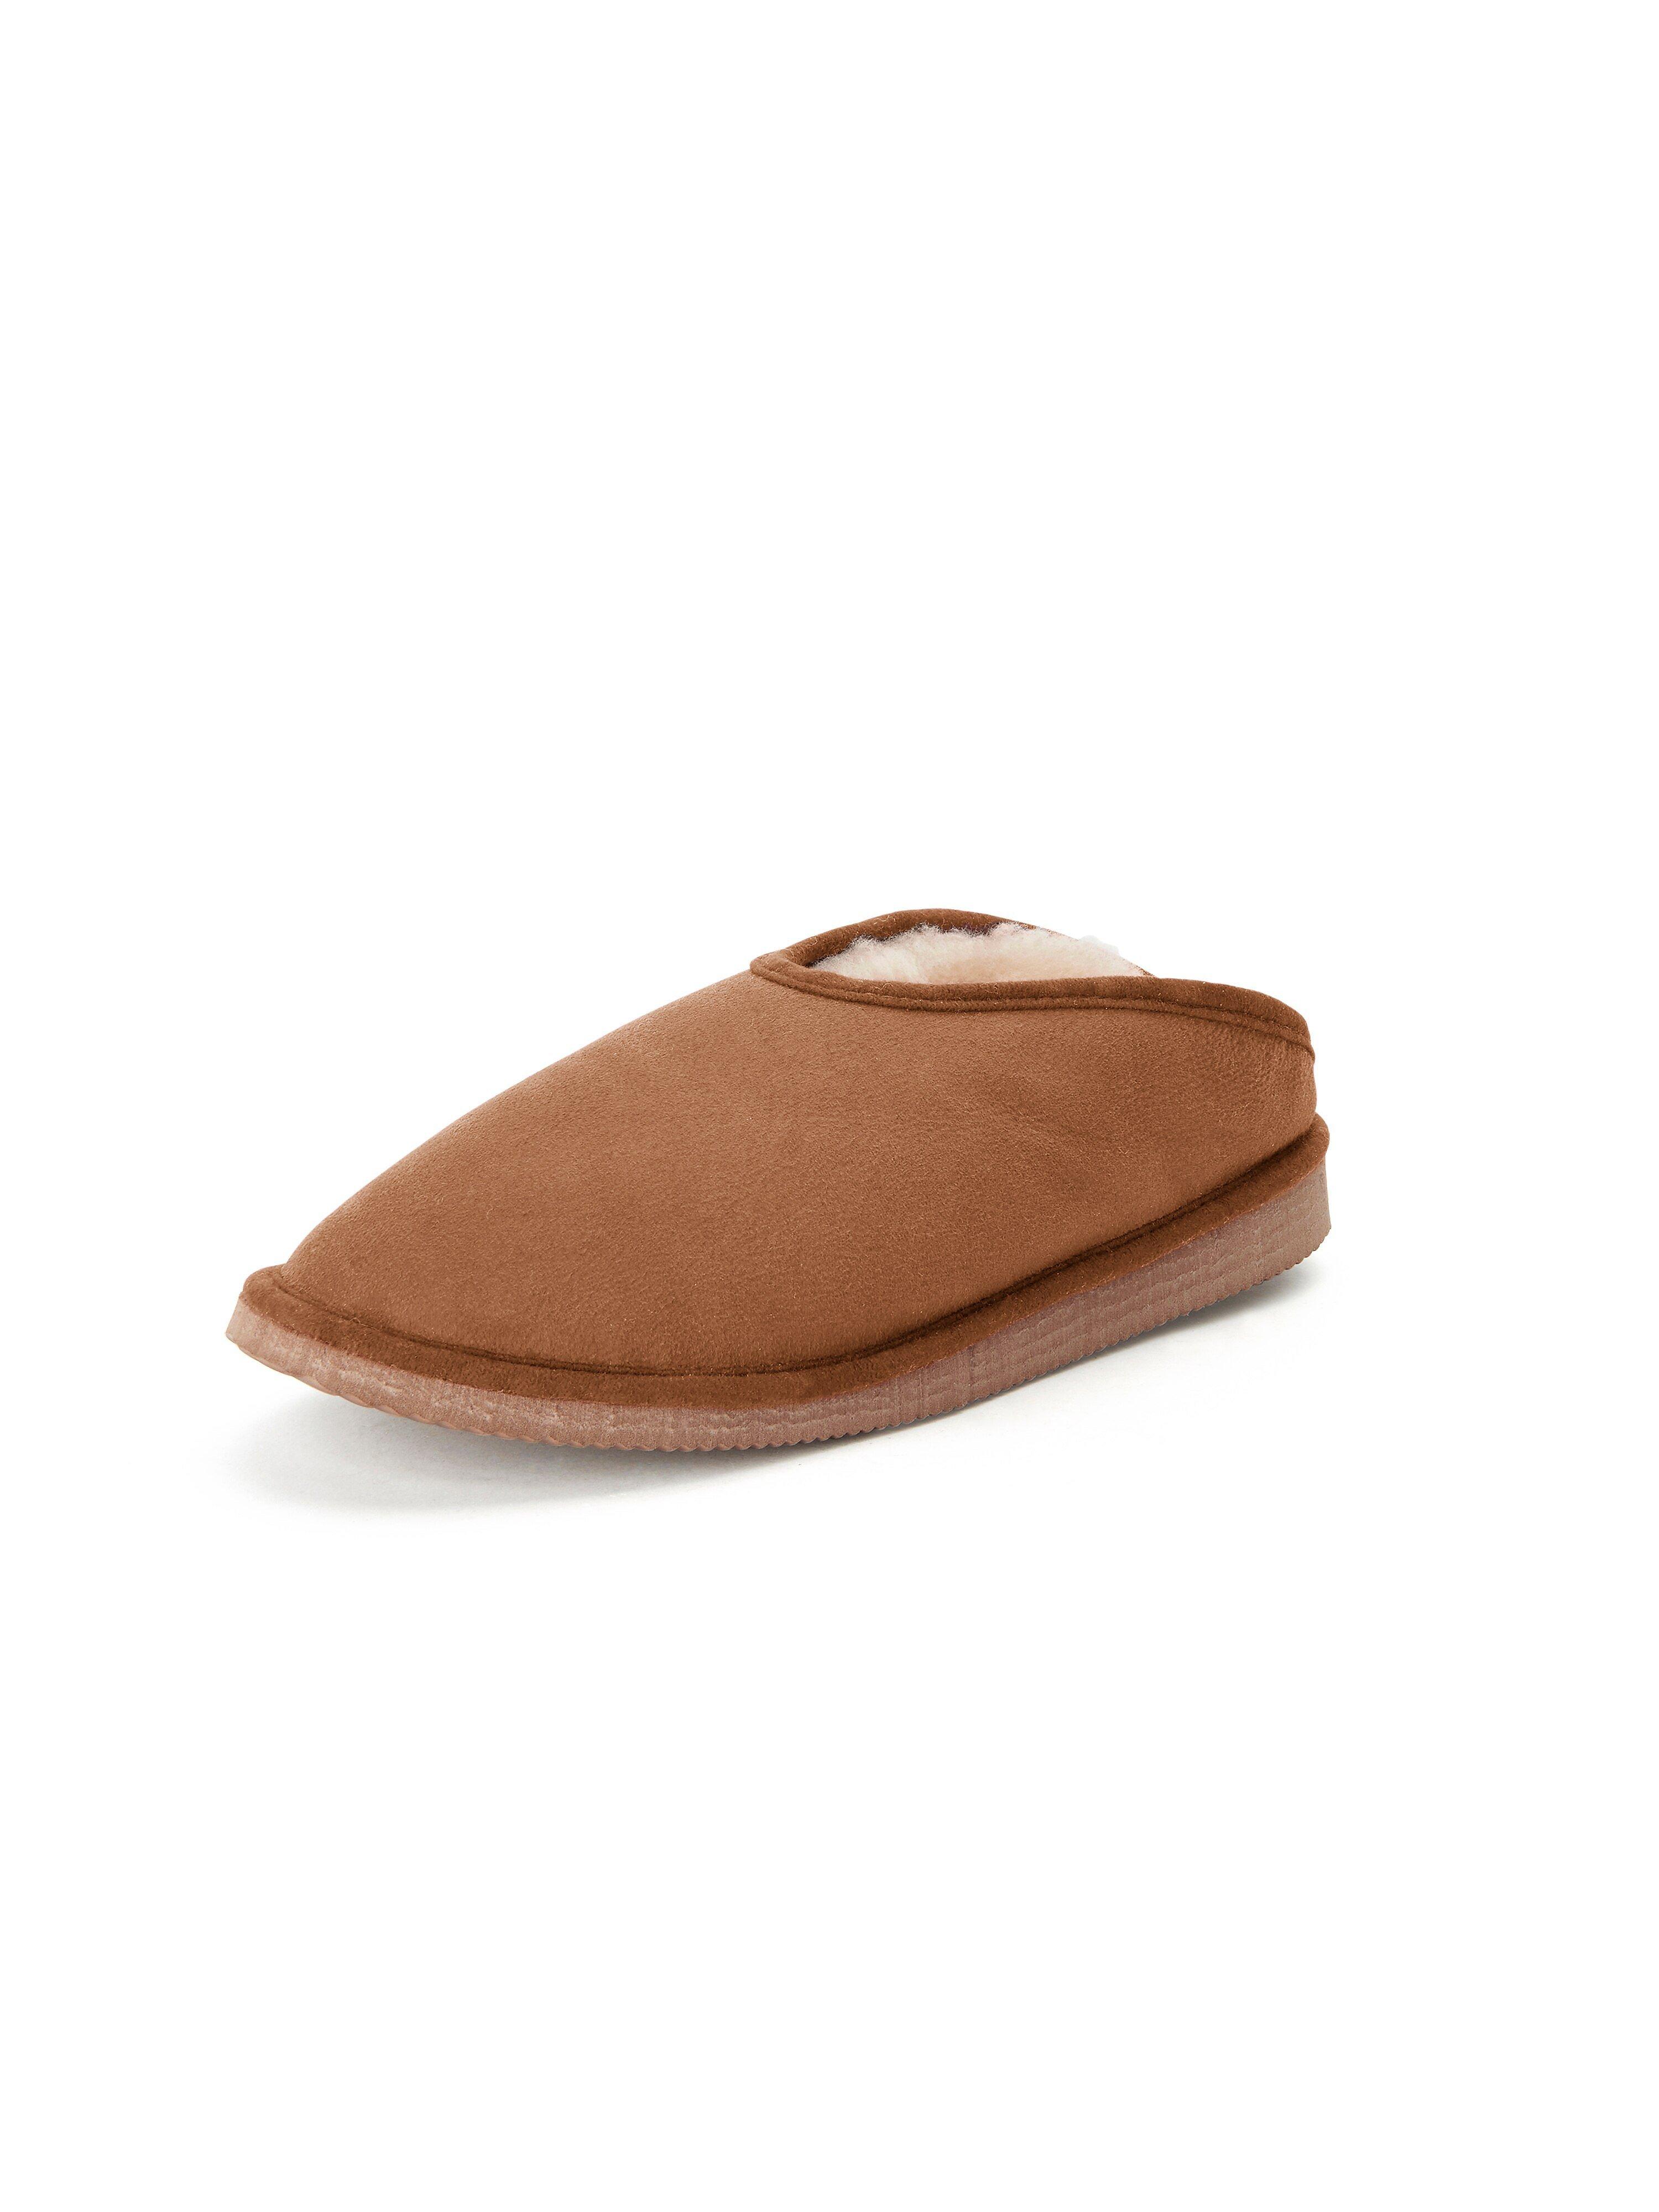 Lammy pantoffels, model Fatima Van Kitzpichler bruin